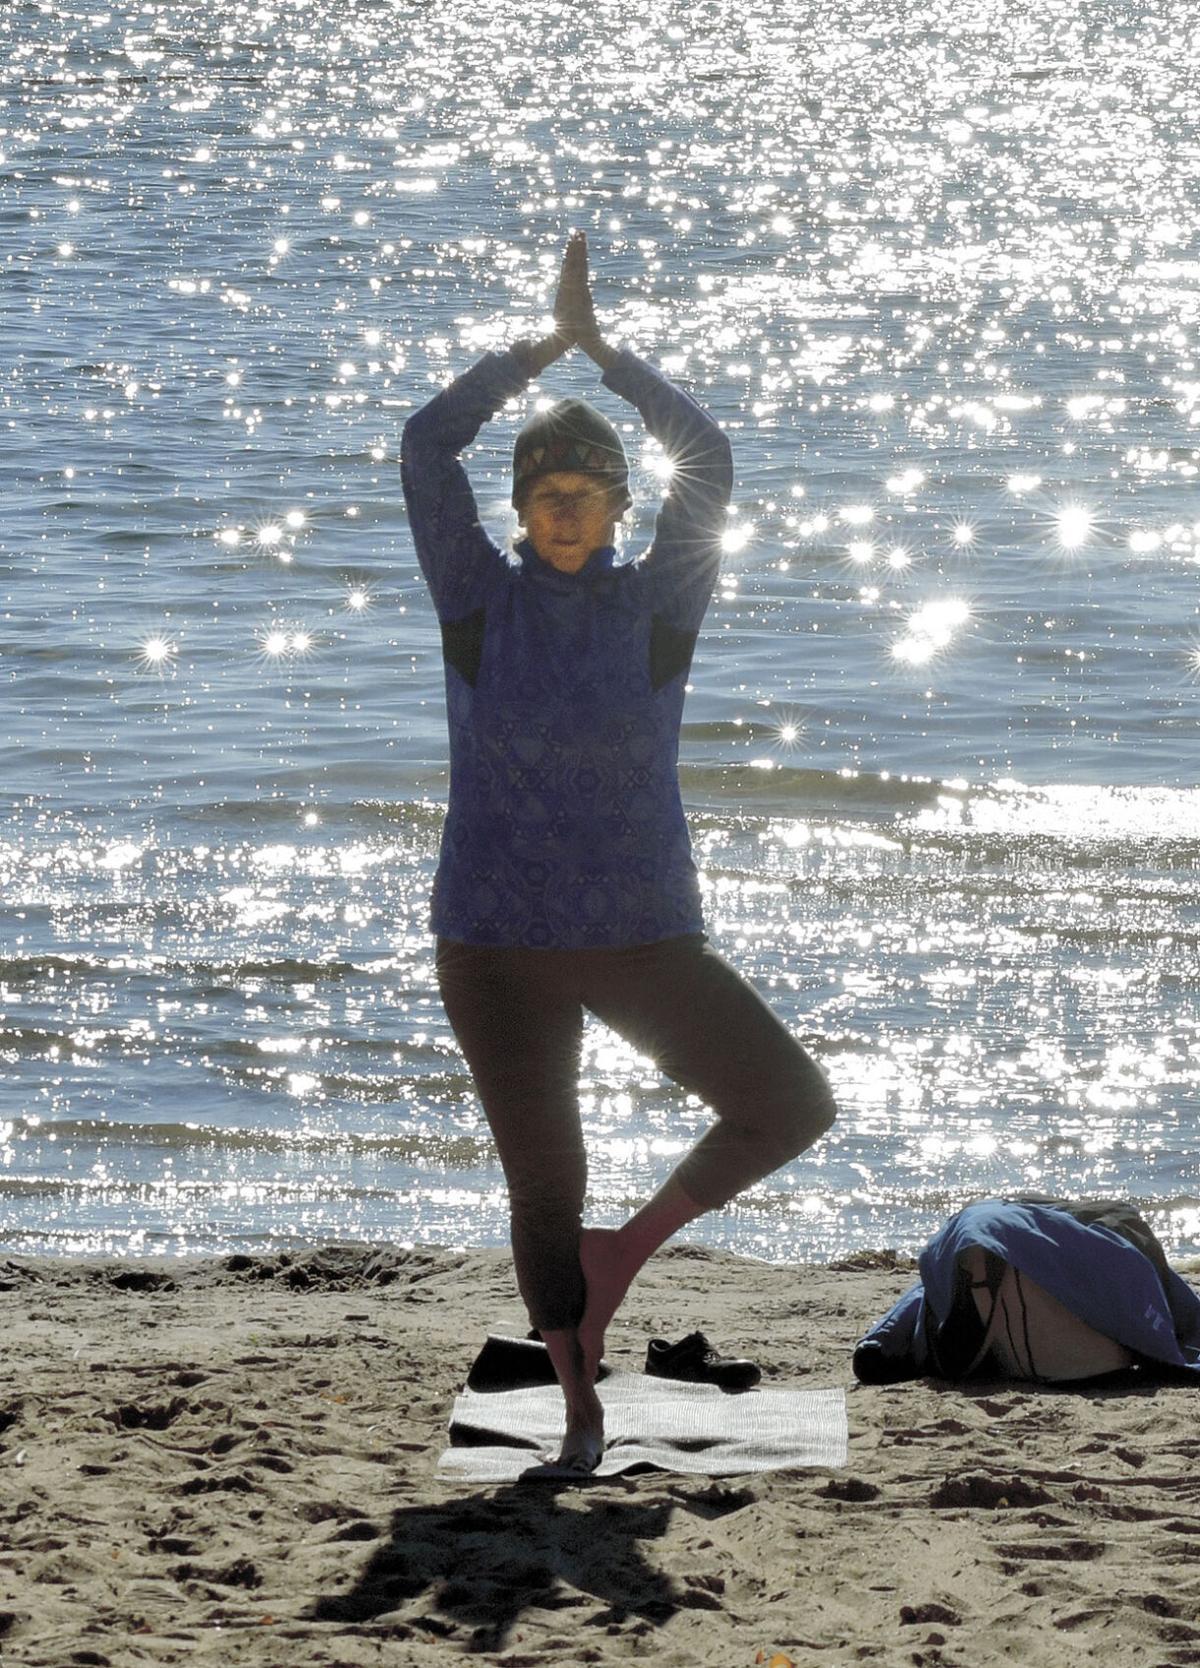 Beach classes help stretch out summer